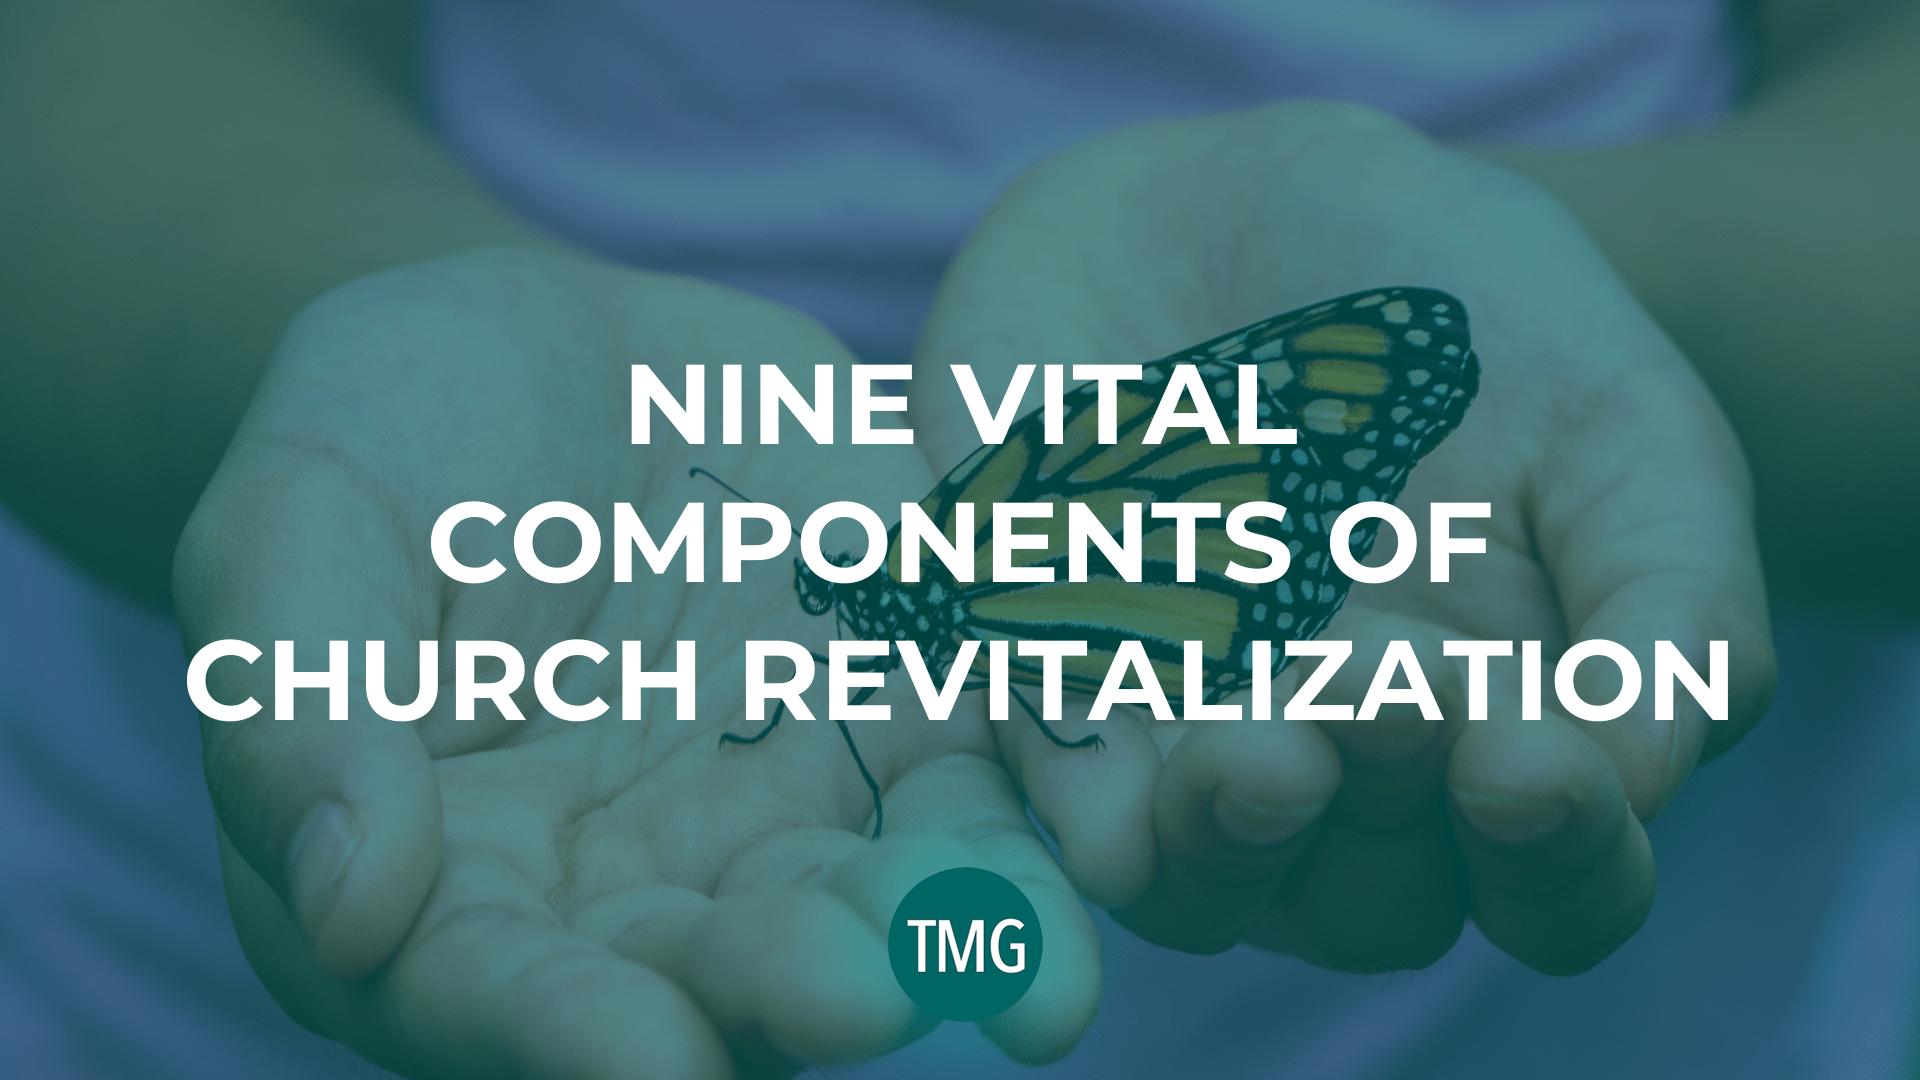 Nine-Vital-Components-of-Church-Revitalization-header-image